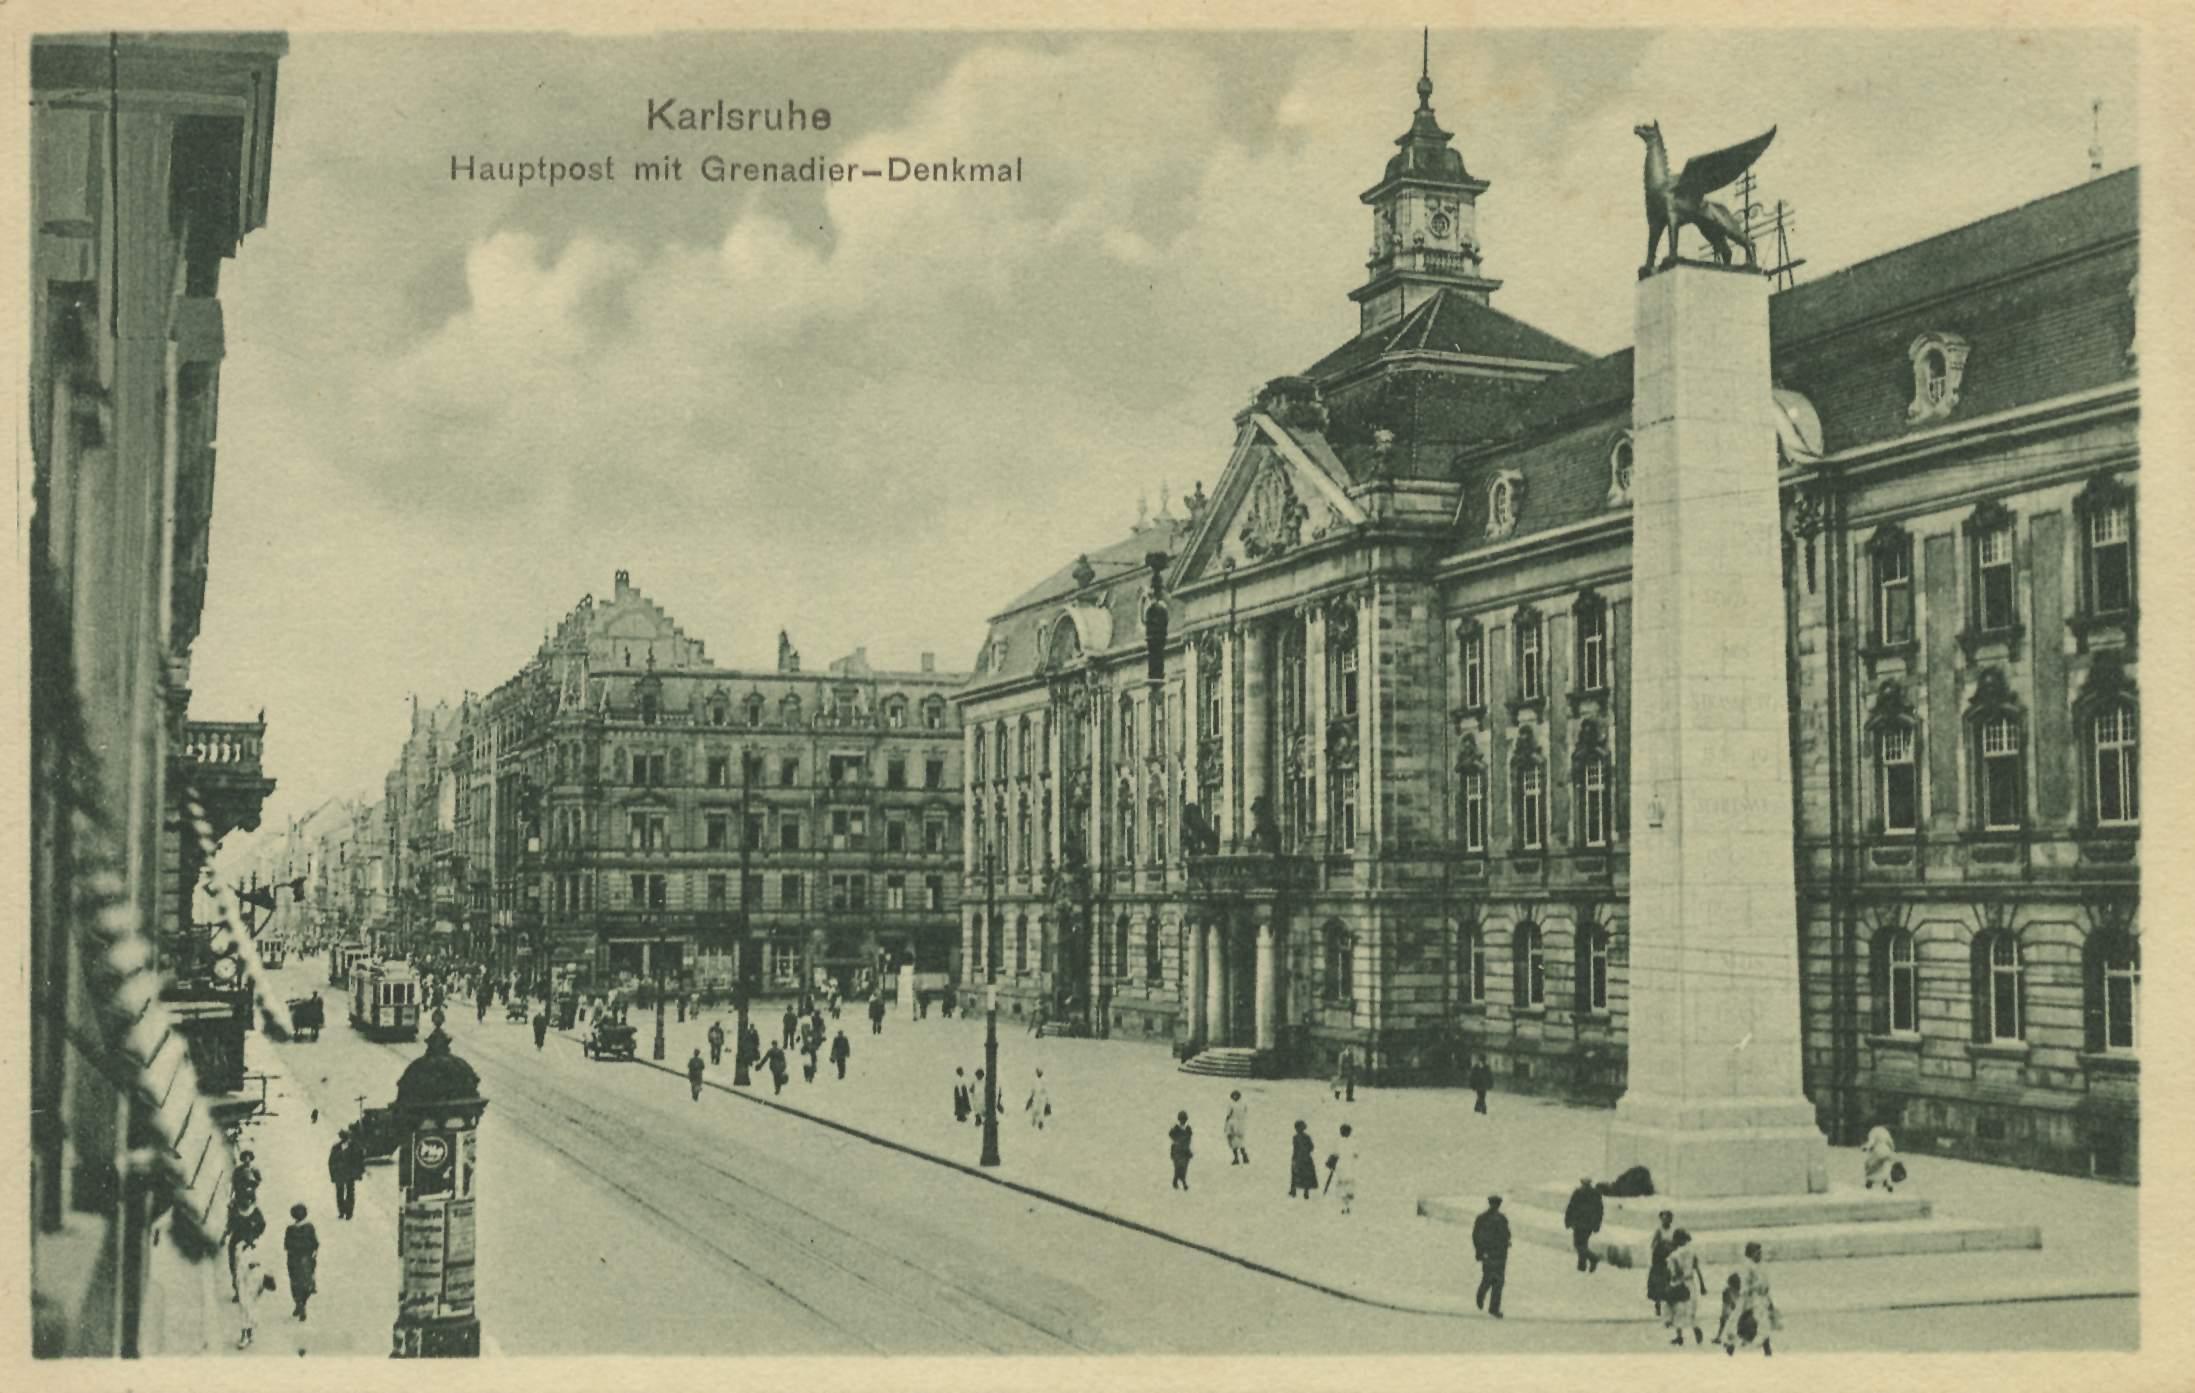 Karlsruhe baden w rttemberg postamt mit grenadierdenkmal for Outlet store karlsruhe